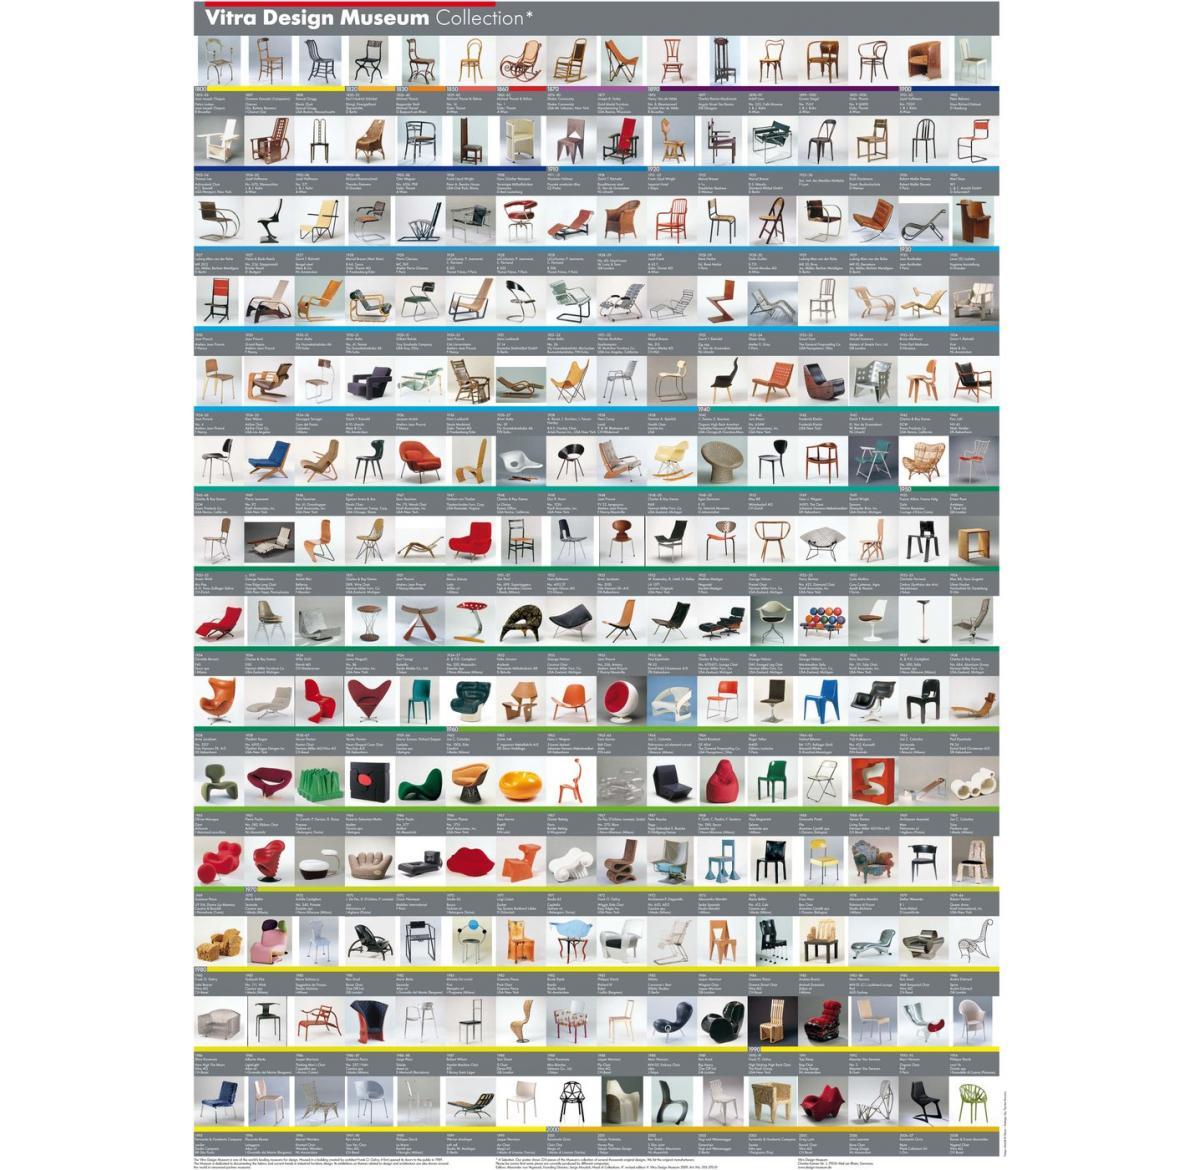 poster vitra design museum collection vitra design museum b ro f r gestaltung. Black Bedroom Furniture Sets. Home Design Ideas